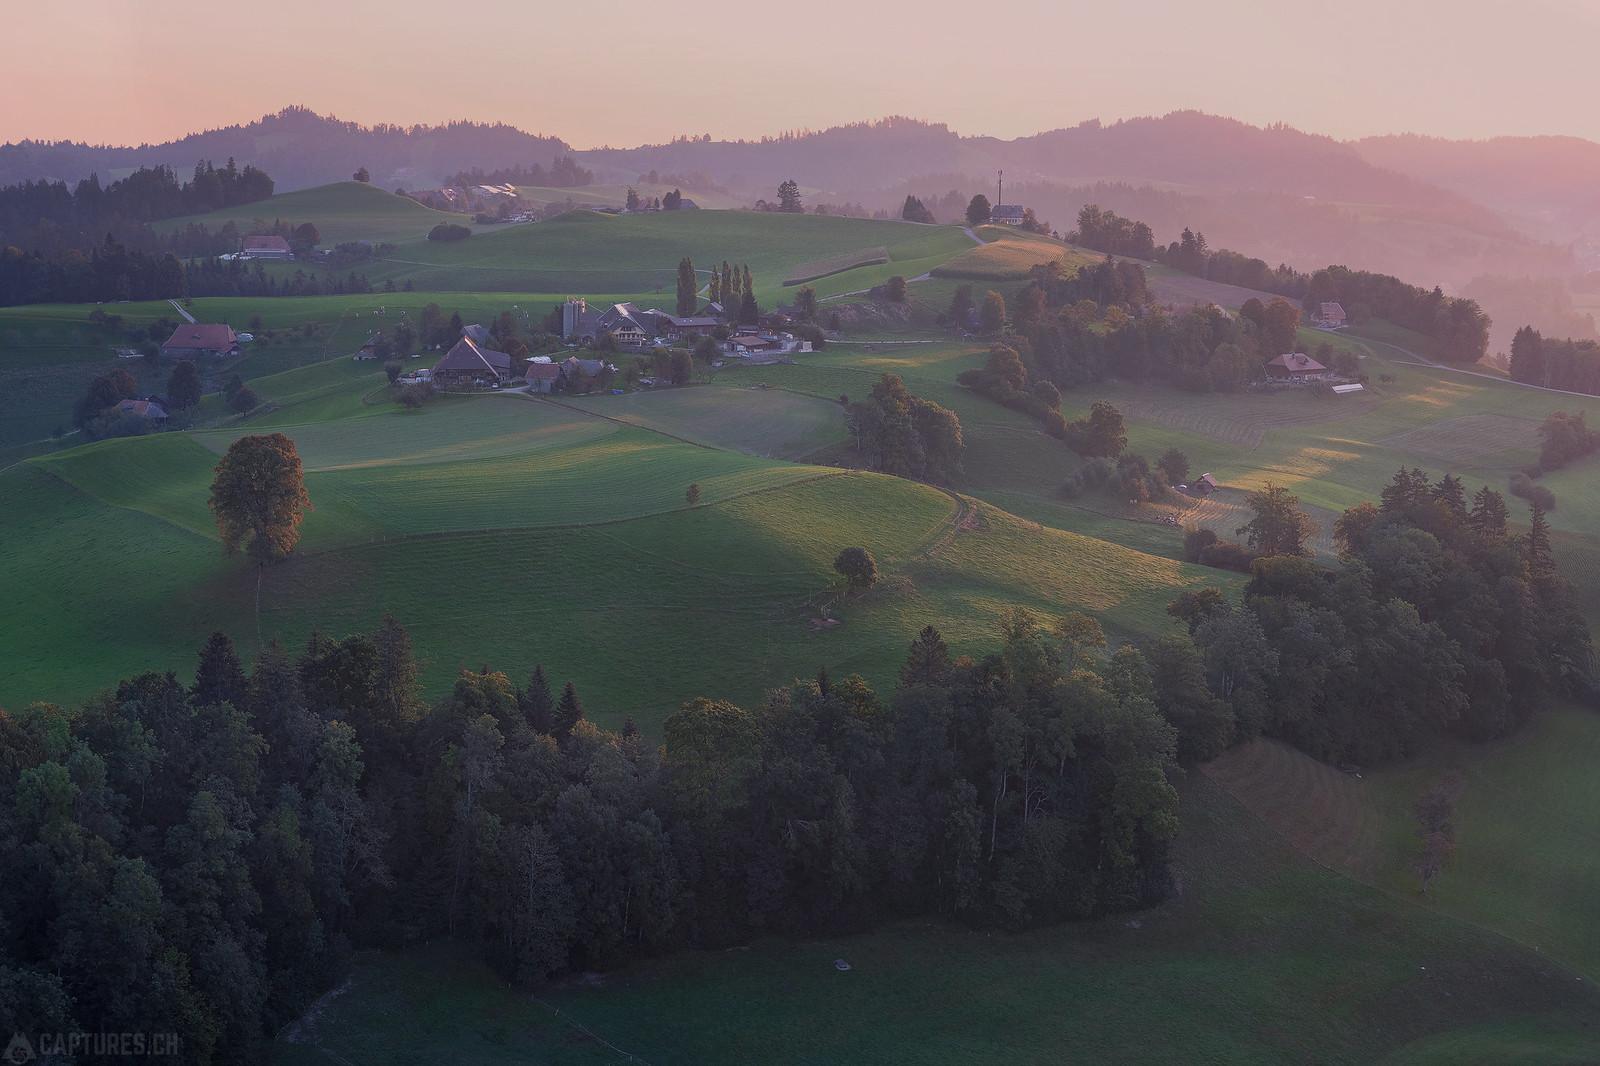 Monring mood - Sumiswald